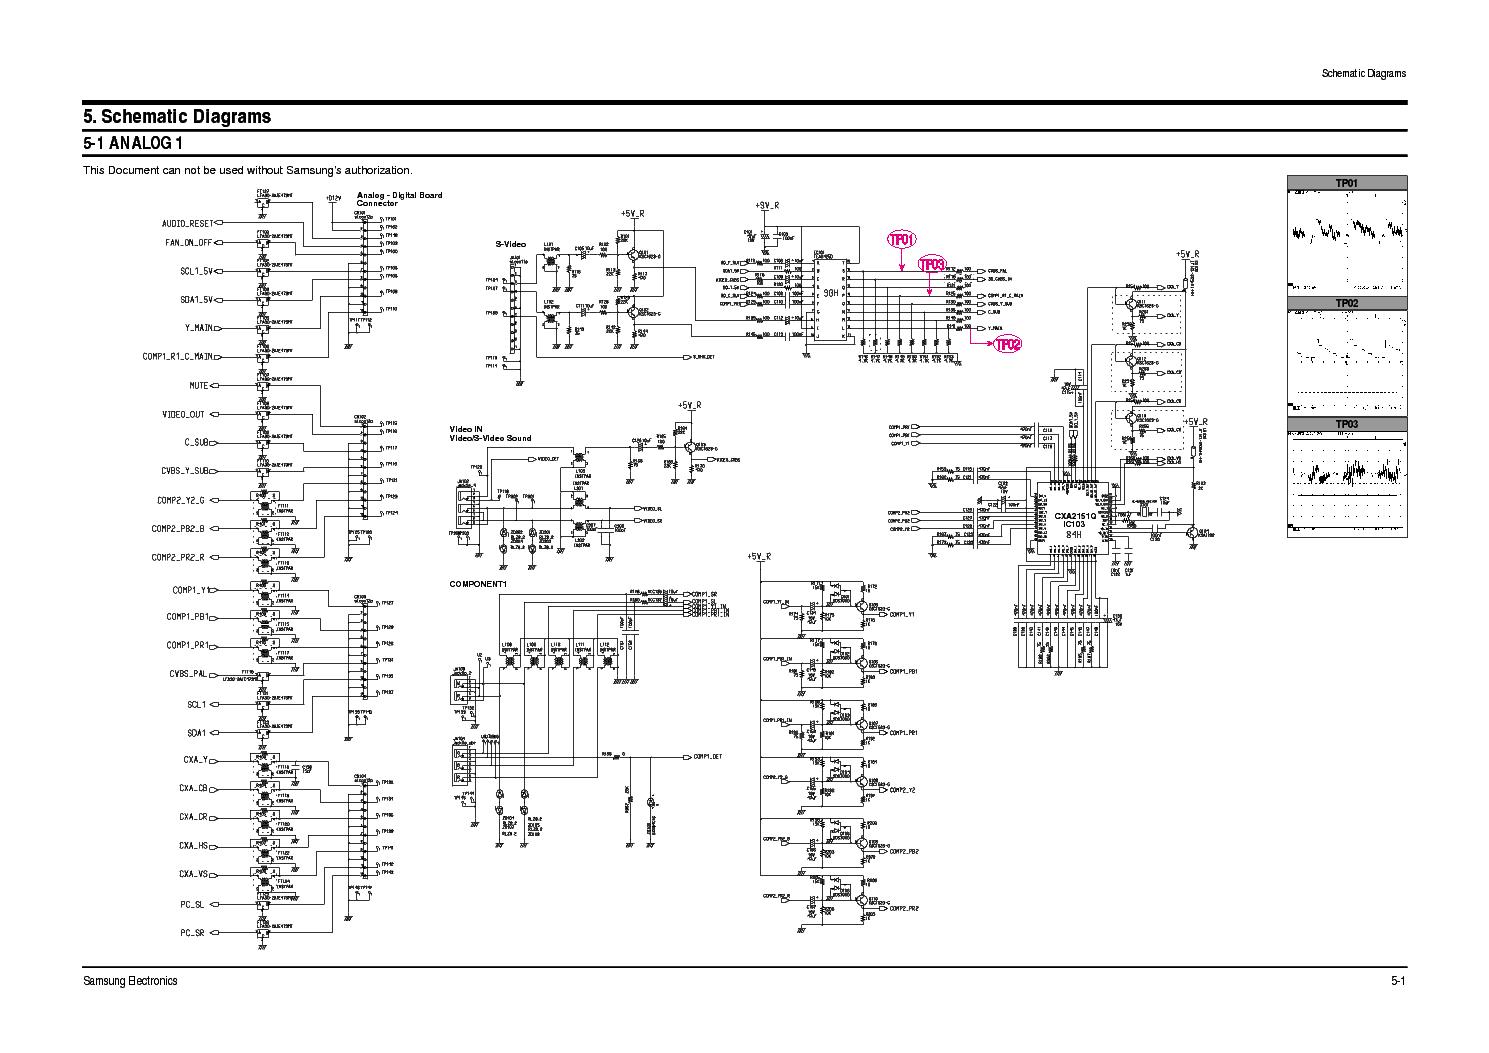 Samsung La26r71b La32r71b La40r71b La32r71w Chassis Gbd26 32 40ks Lcd Tv Schematic Diagram Http Elektrotanyacom Bekotelchassis127